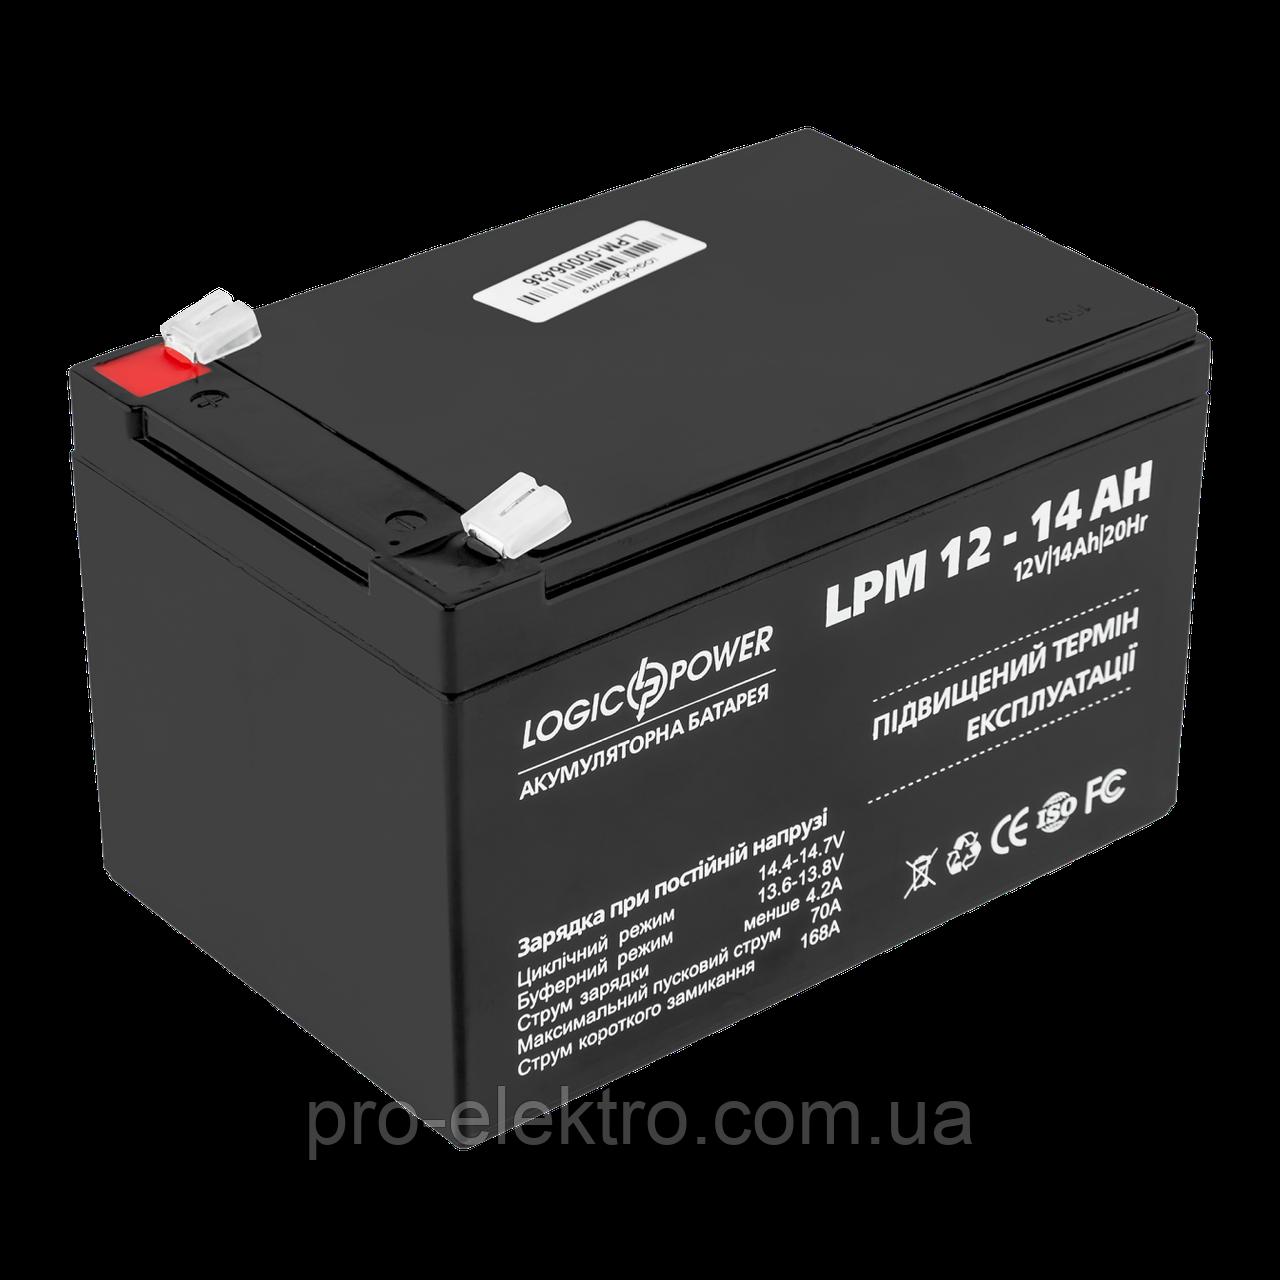 Аккумулятор кислотный AGM LogicPower LPM 12 - 14 AH